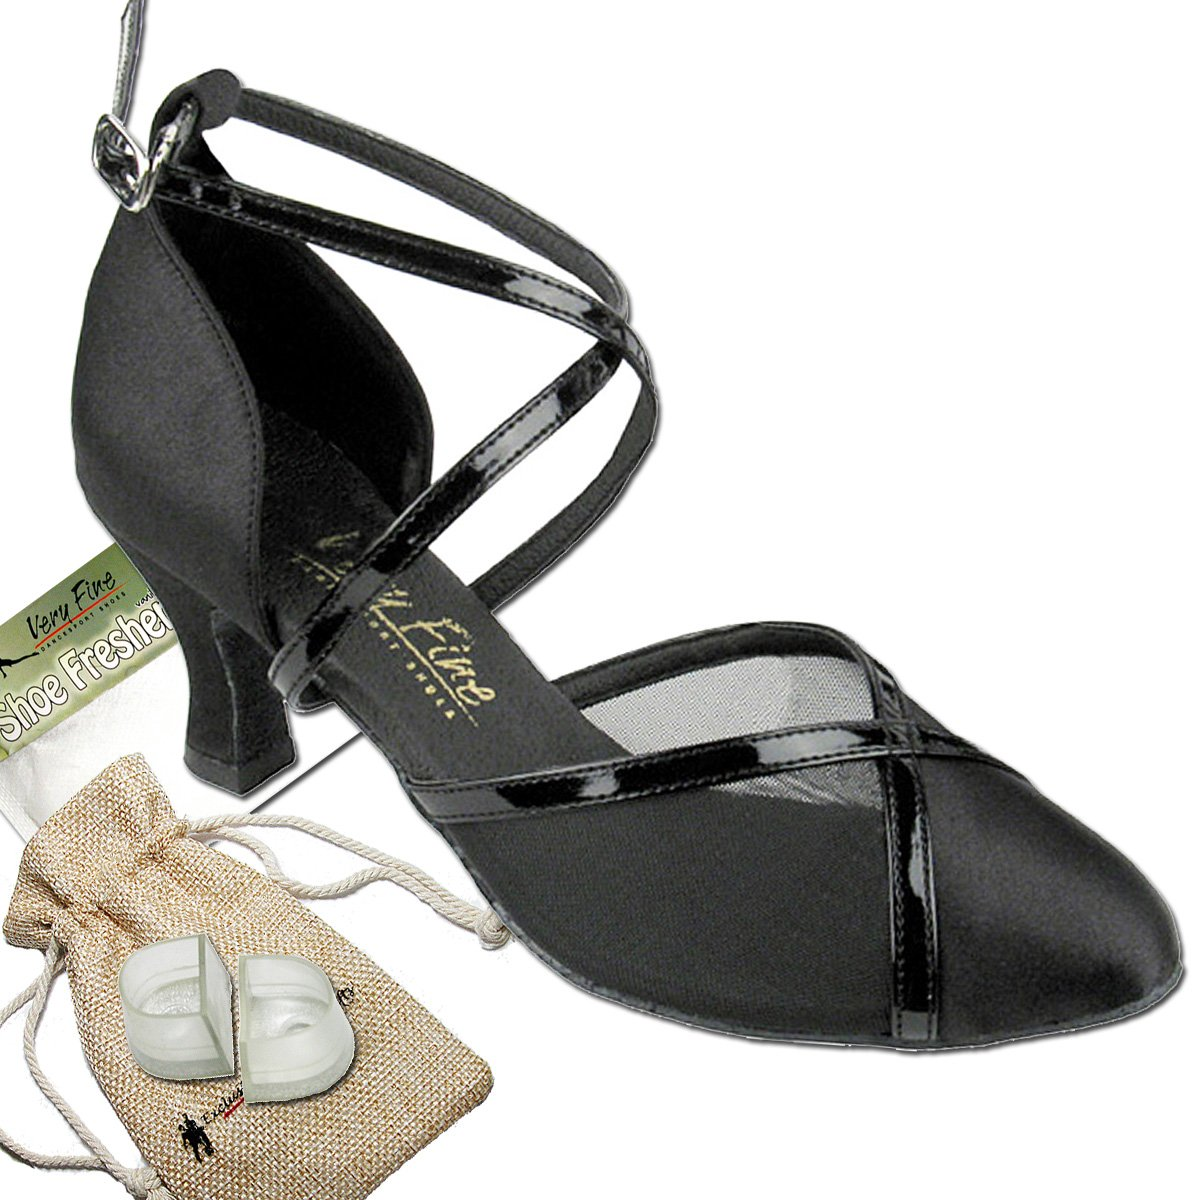 Women's Ballroom Dance Shoes Tango Wedding Salsa Dance Shoes Black Satin & Black Mesh 9622EB Comfortable - Very Fine 2.5'' Heel 7.5 M US [Bundle of 5] by Very Fine Dance Shoes (Image #1)